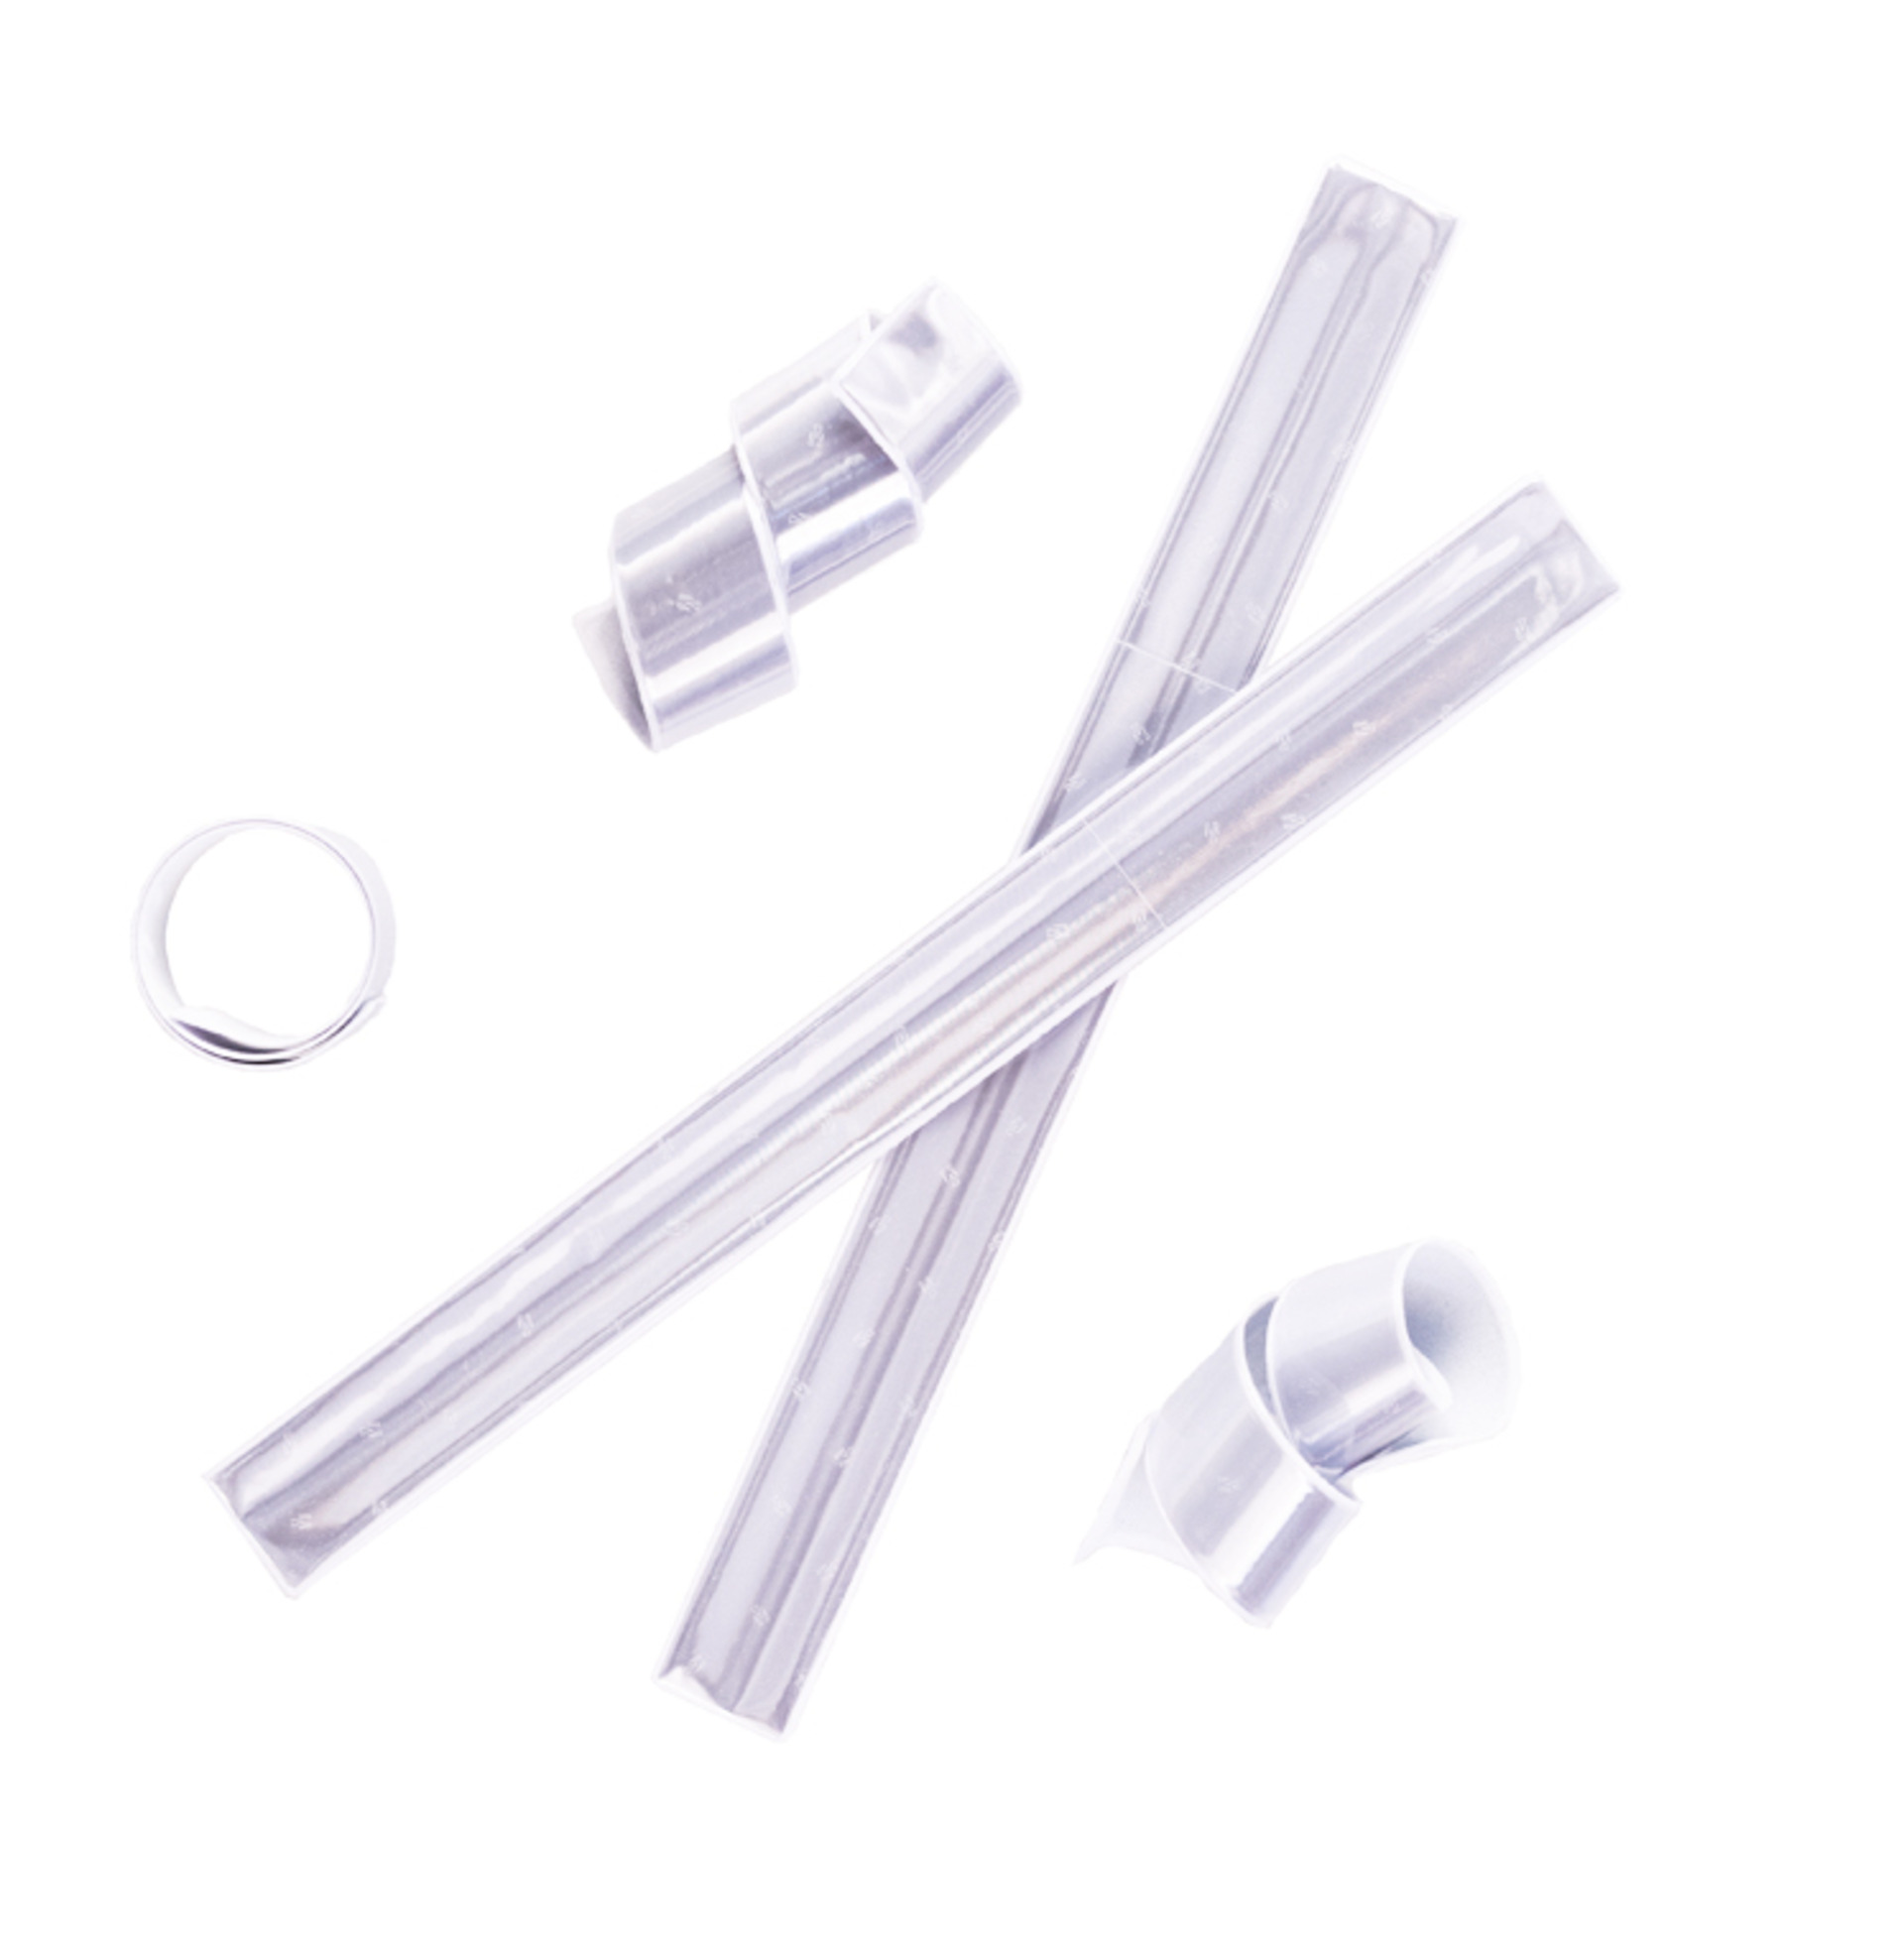 Inzep bílá Reflexní páska FLEXI 995 samonavíjecí bílá bílá 32x3cm bílá